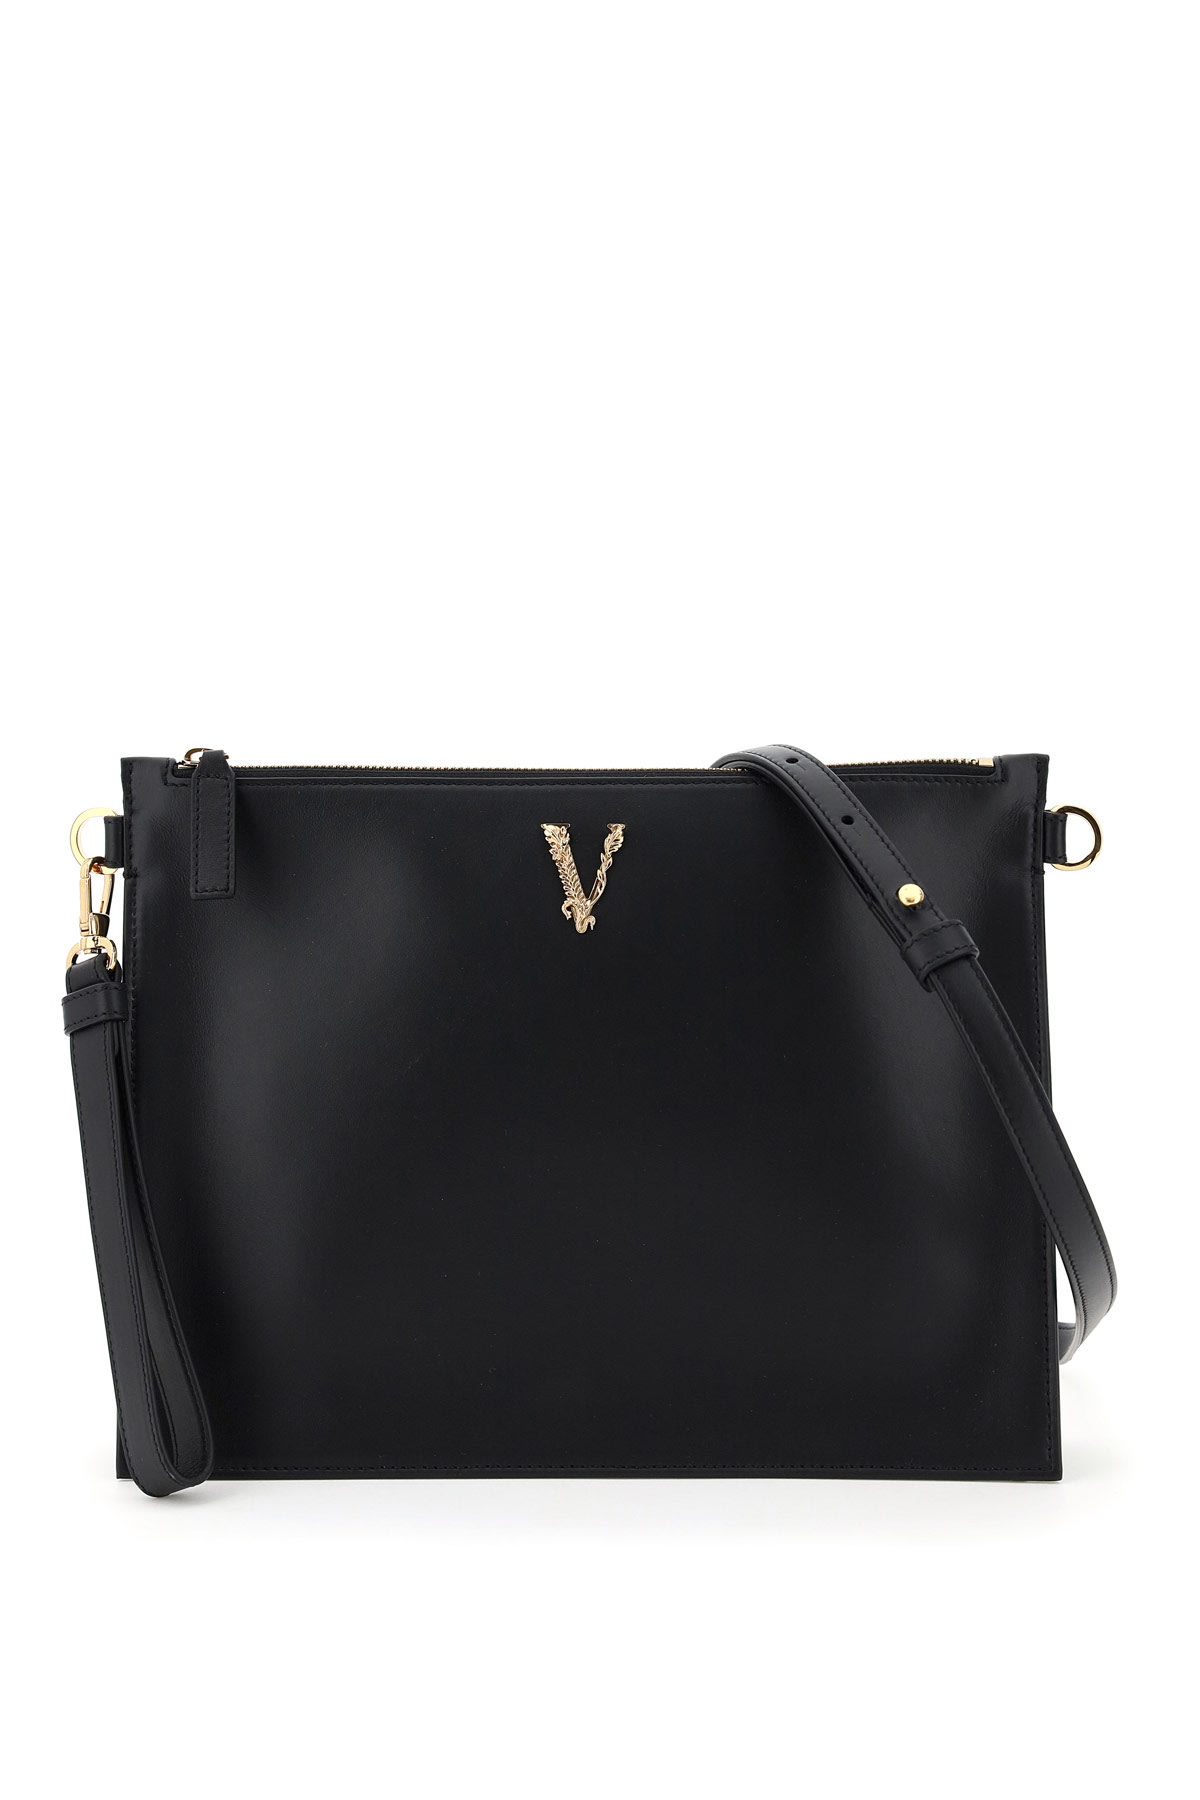 Versace Virtus Clutch